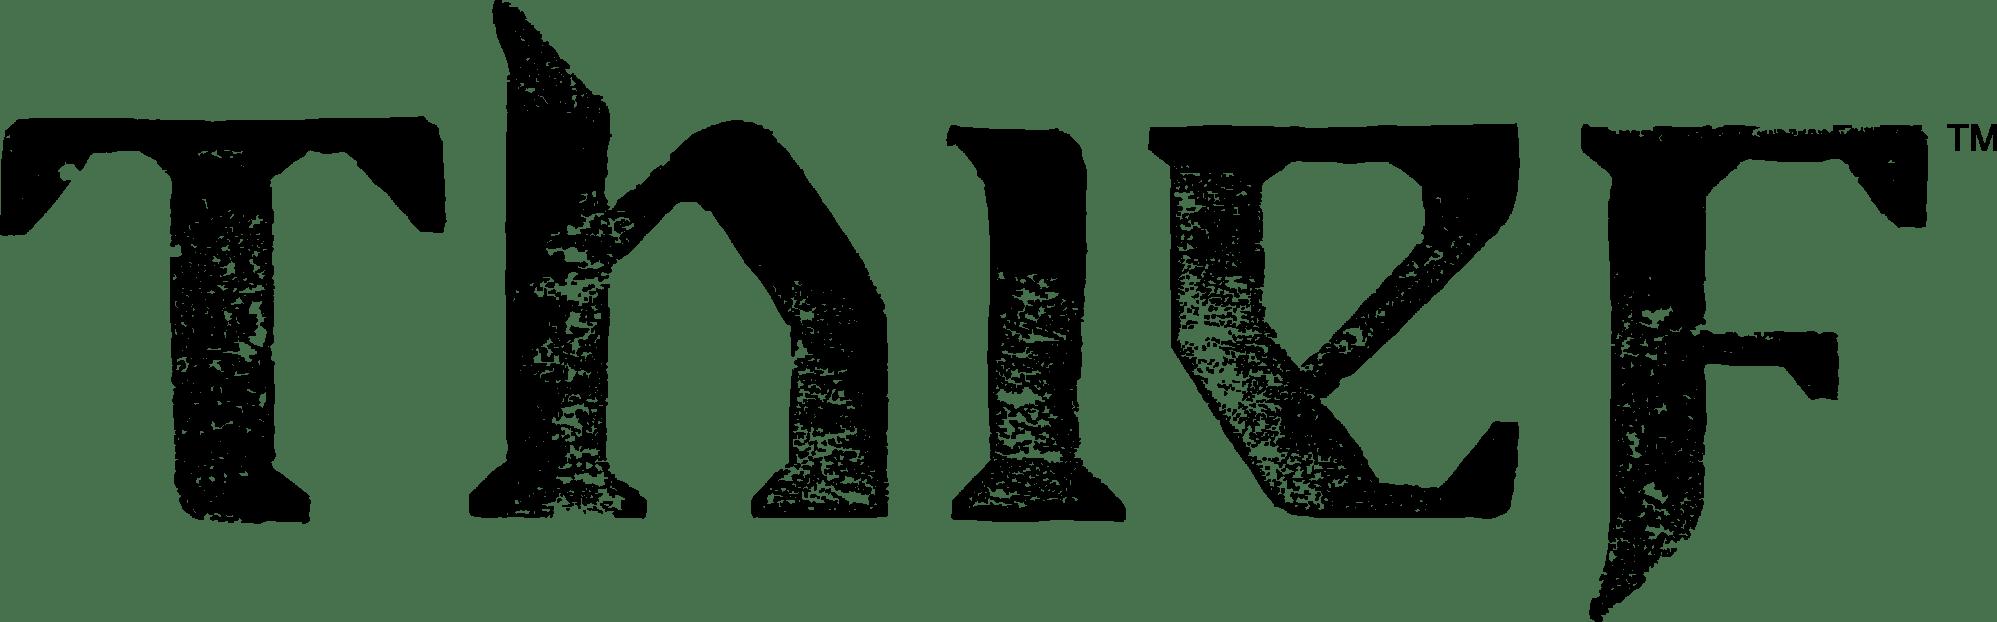 Thief_-_Logo_-_2014